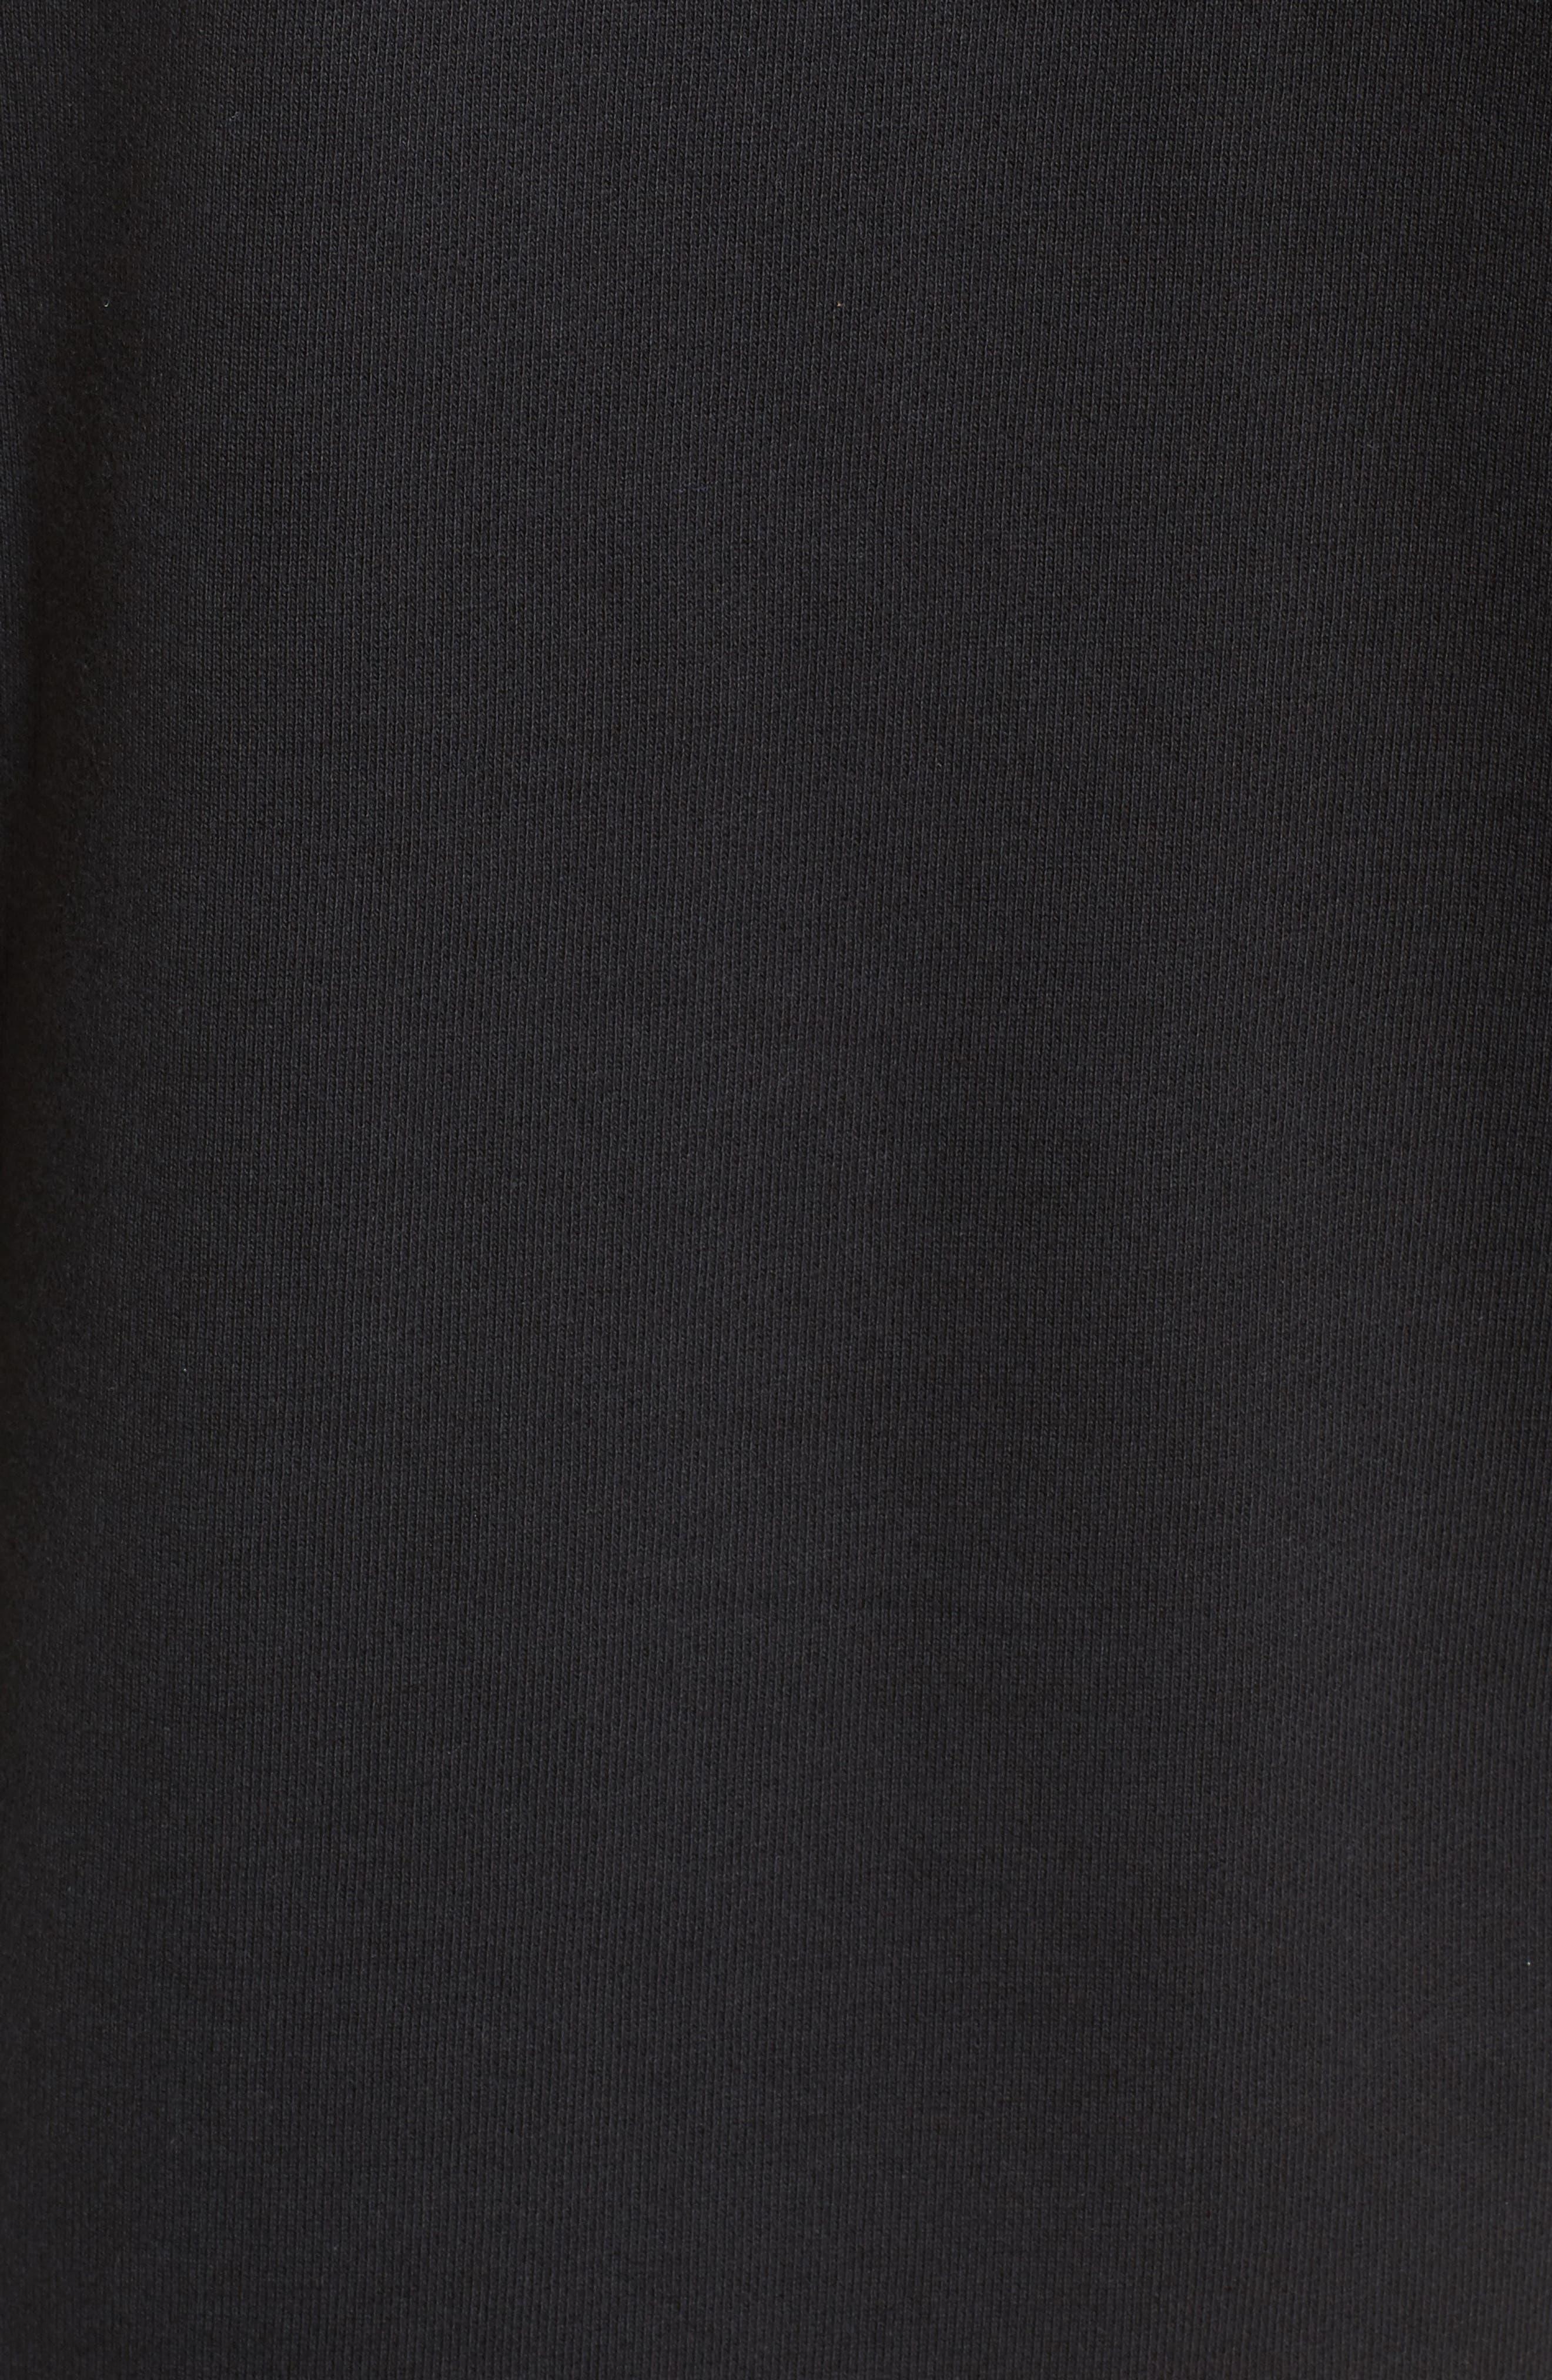 Sportswear City of Flight Hooded T-Shirt,                             Alternate thumbnail 5, color,                             Black/ White